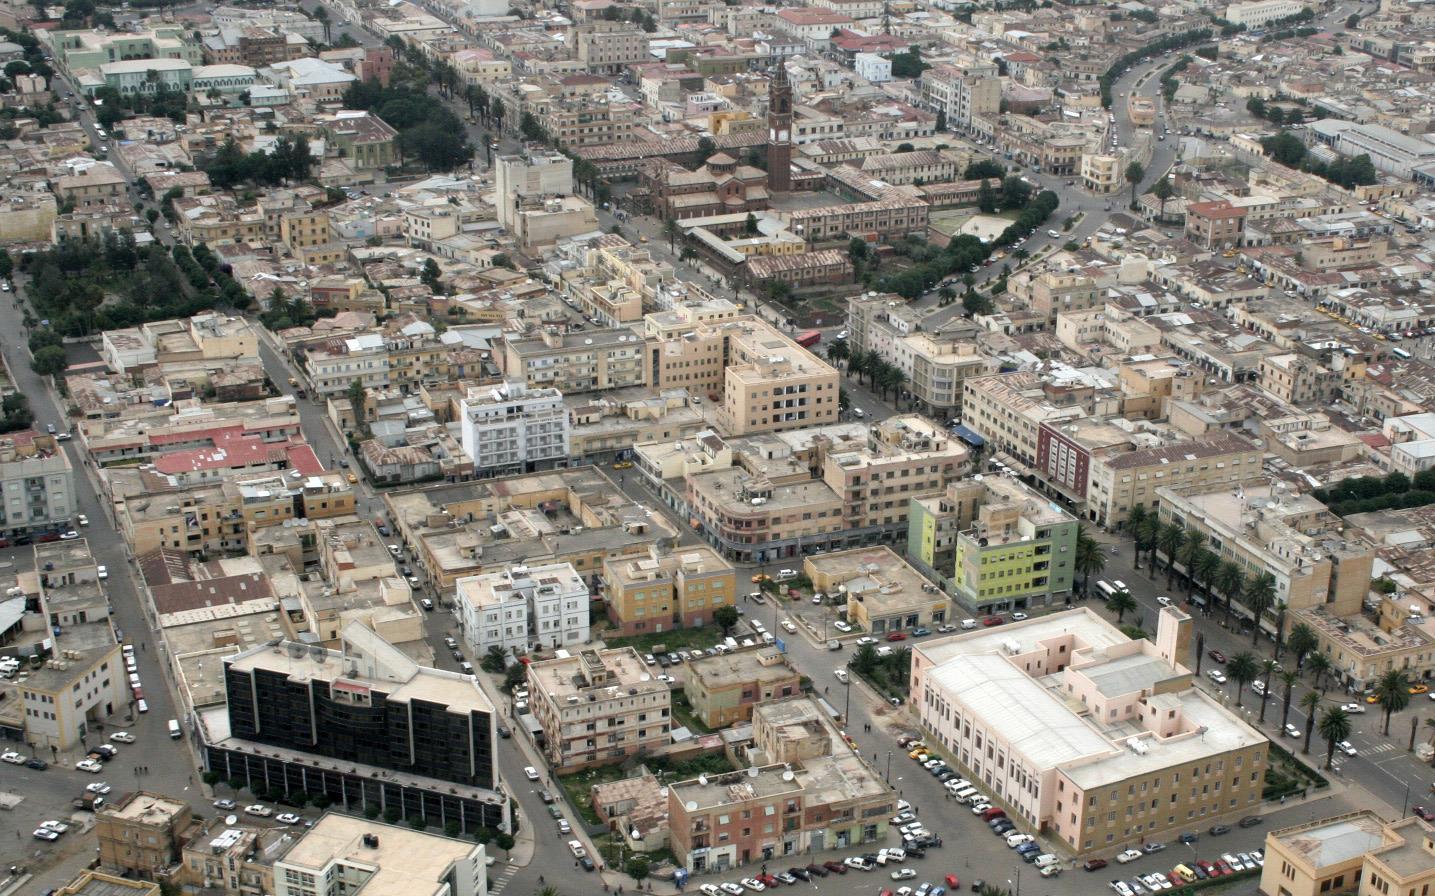 Asmara, capitale de l'Érythrée